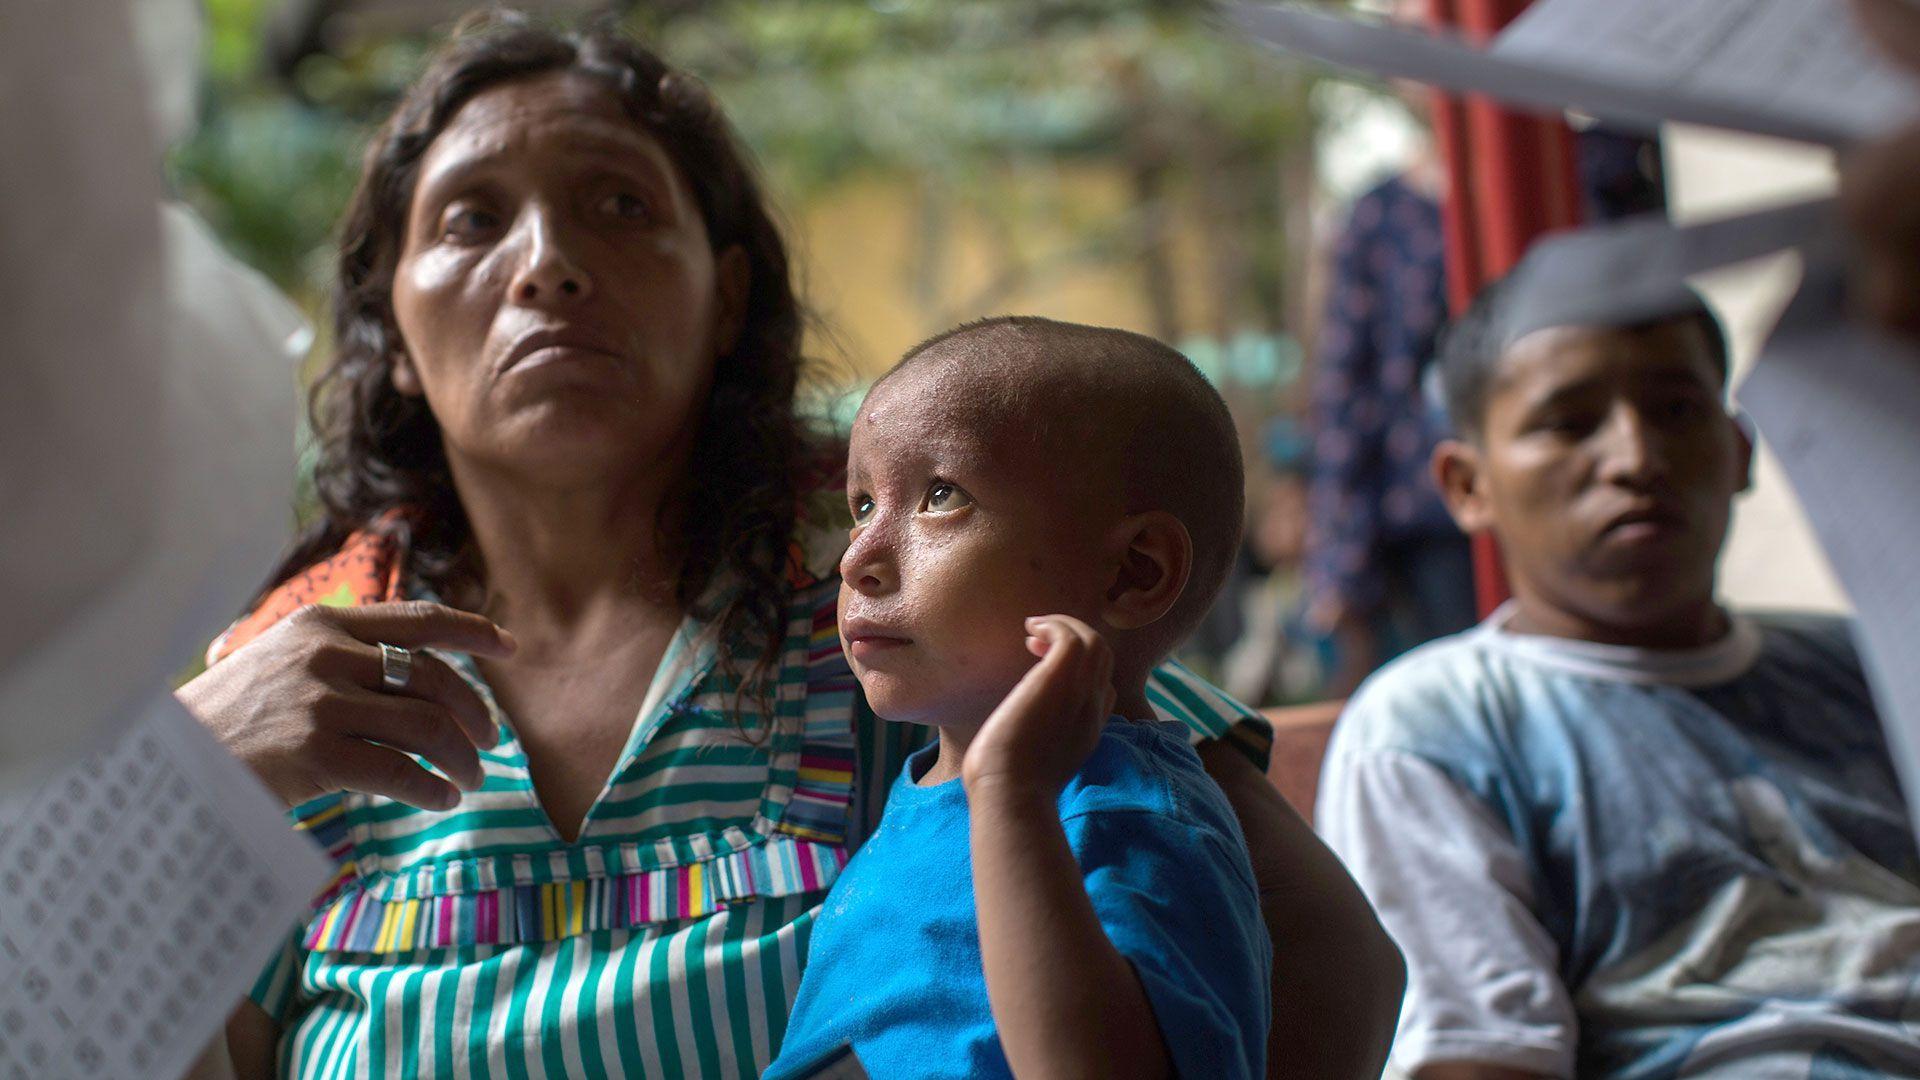 https://en.mercopress.com/data/cache/noticias/71971/0x0/venezuela-salud-2.jpg